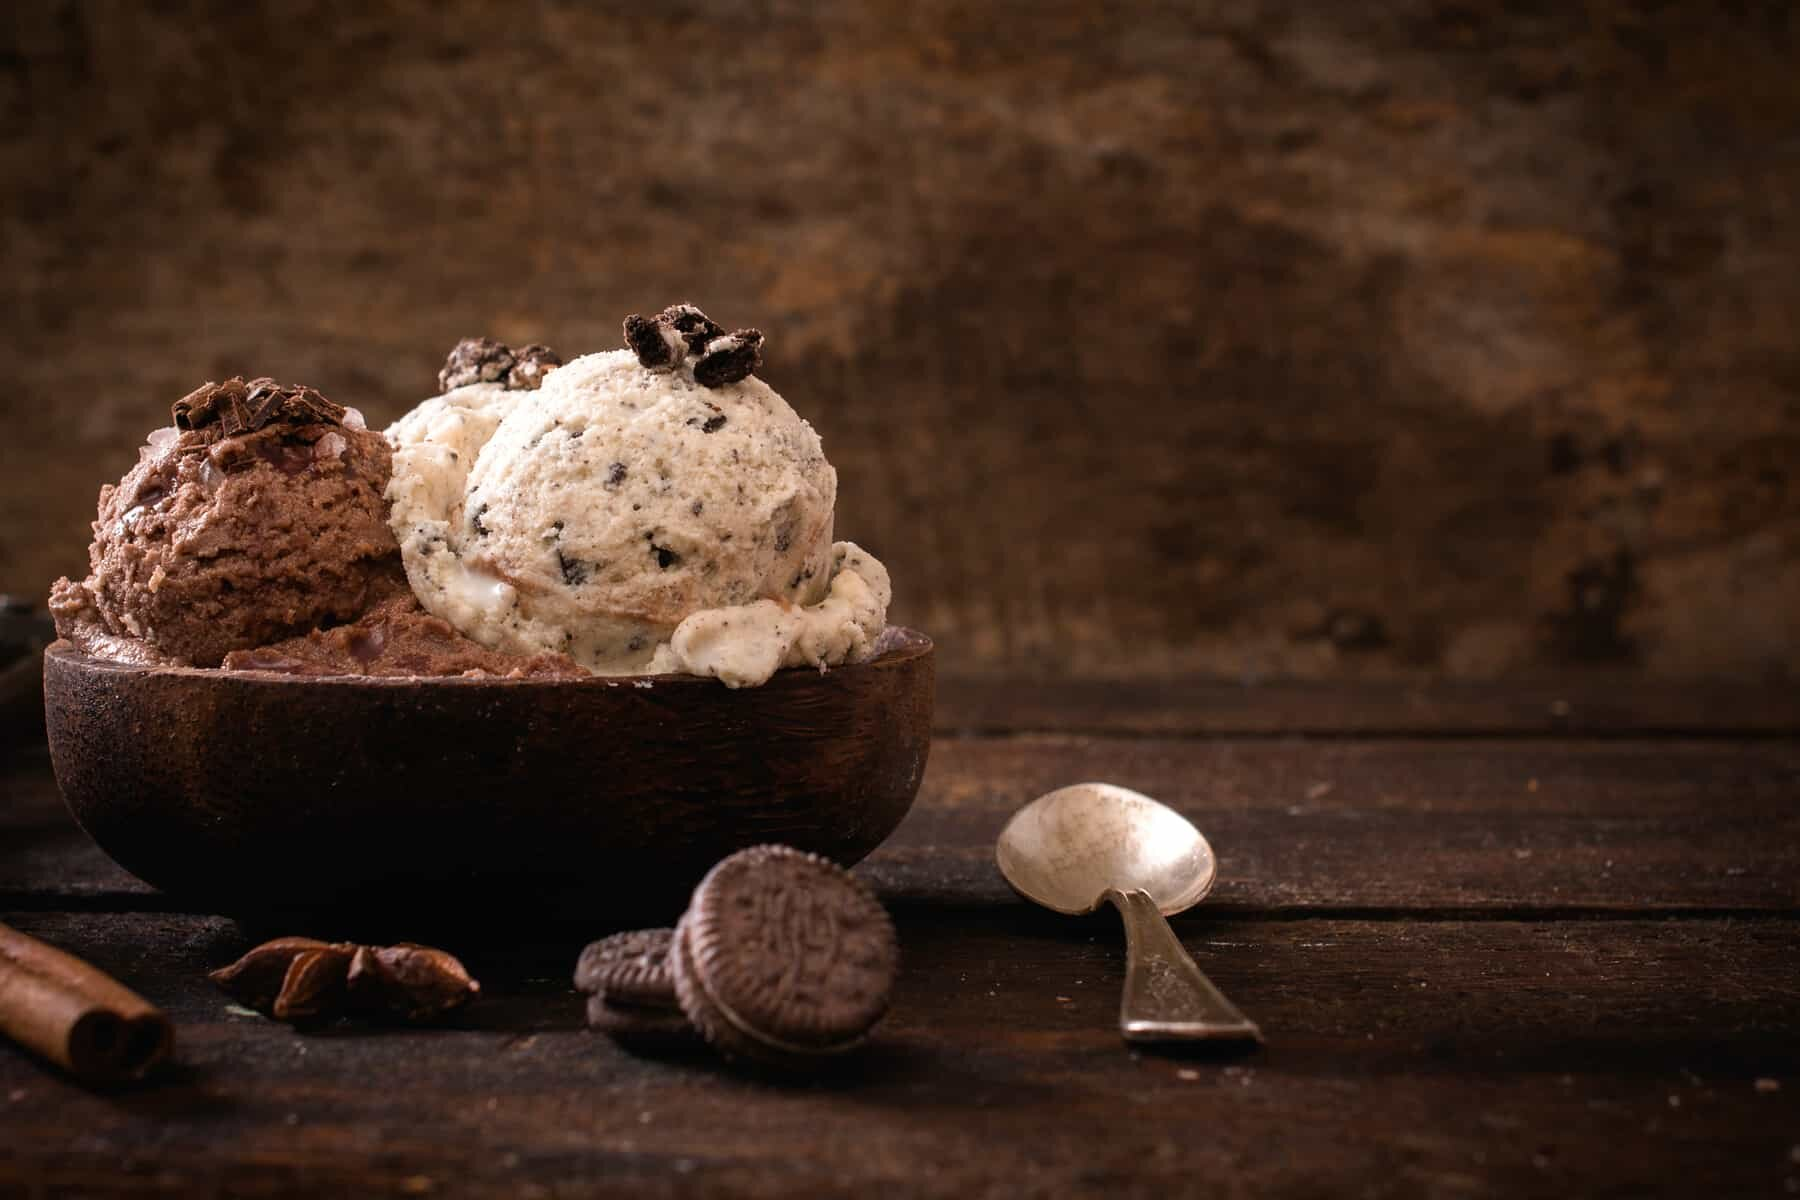 Italian food. Chocolate and stracciatella ice creams in a wooden bowl